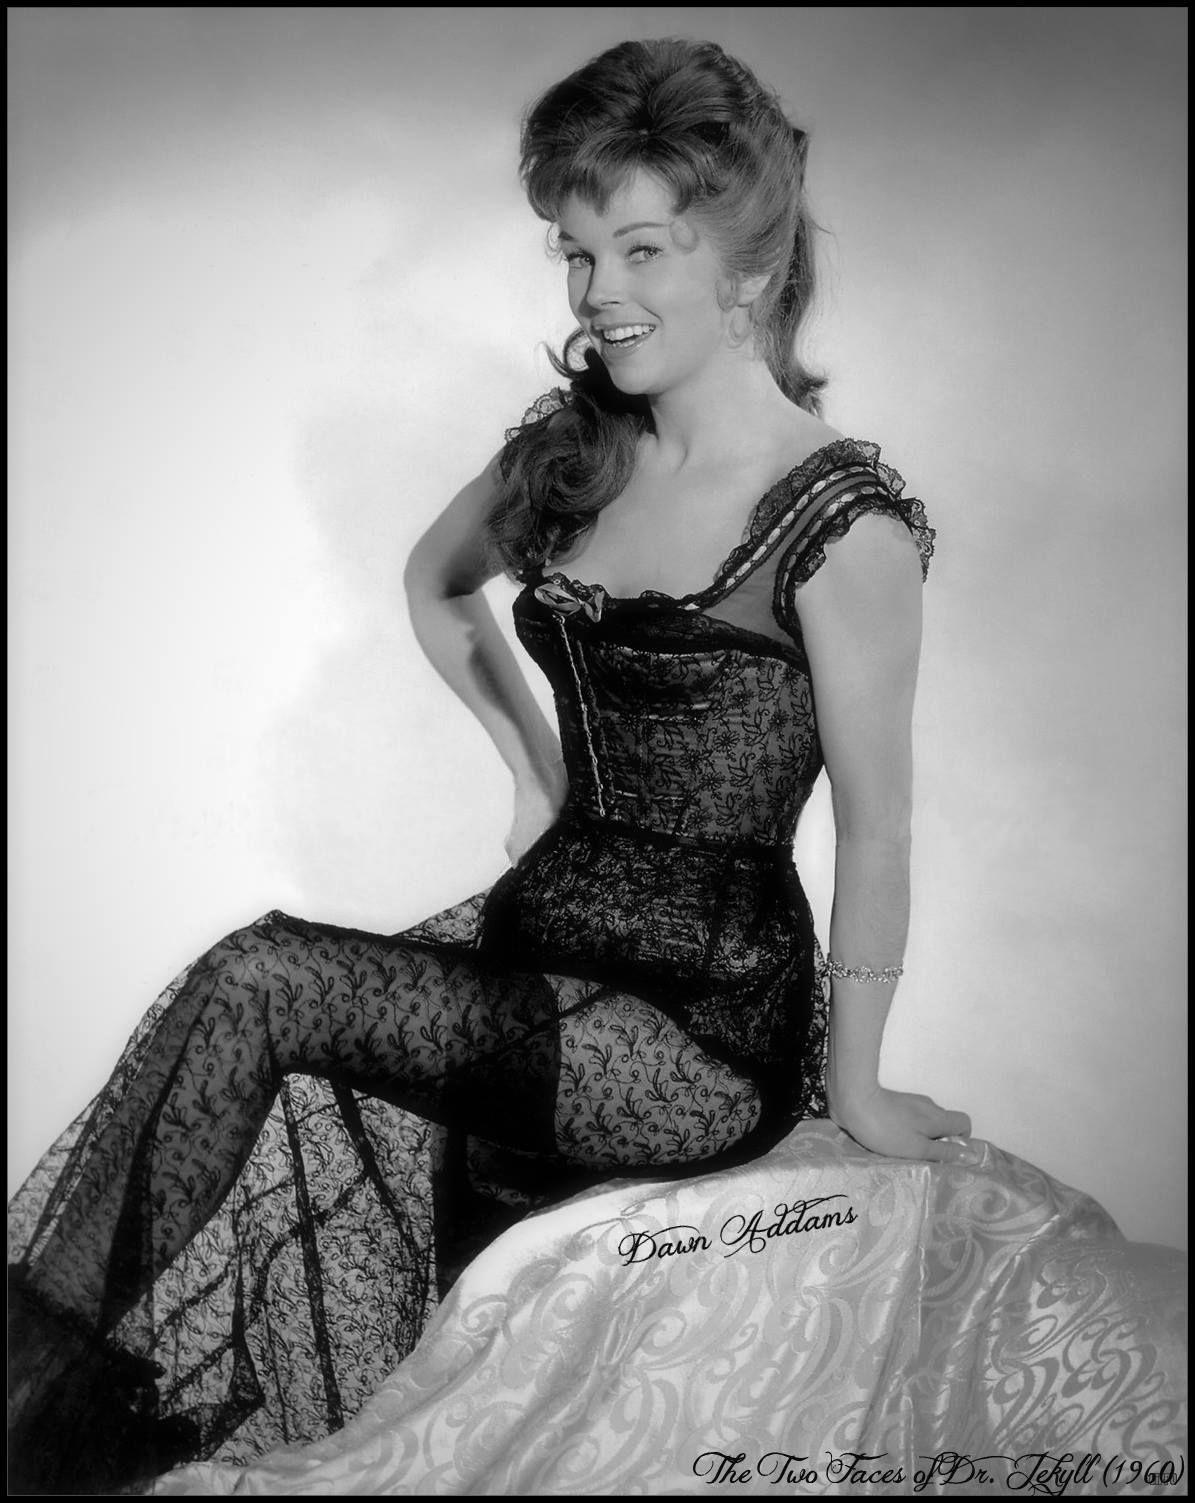 June Kirby